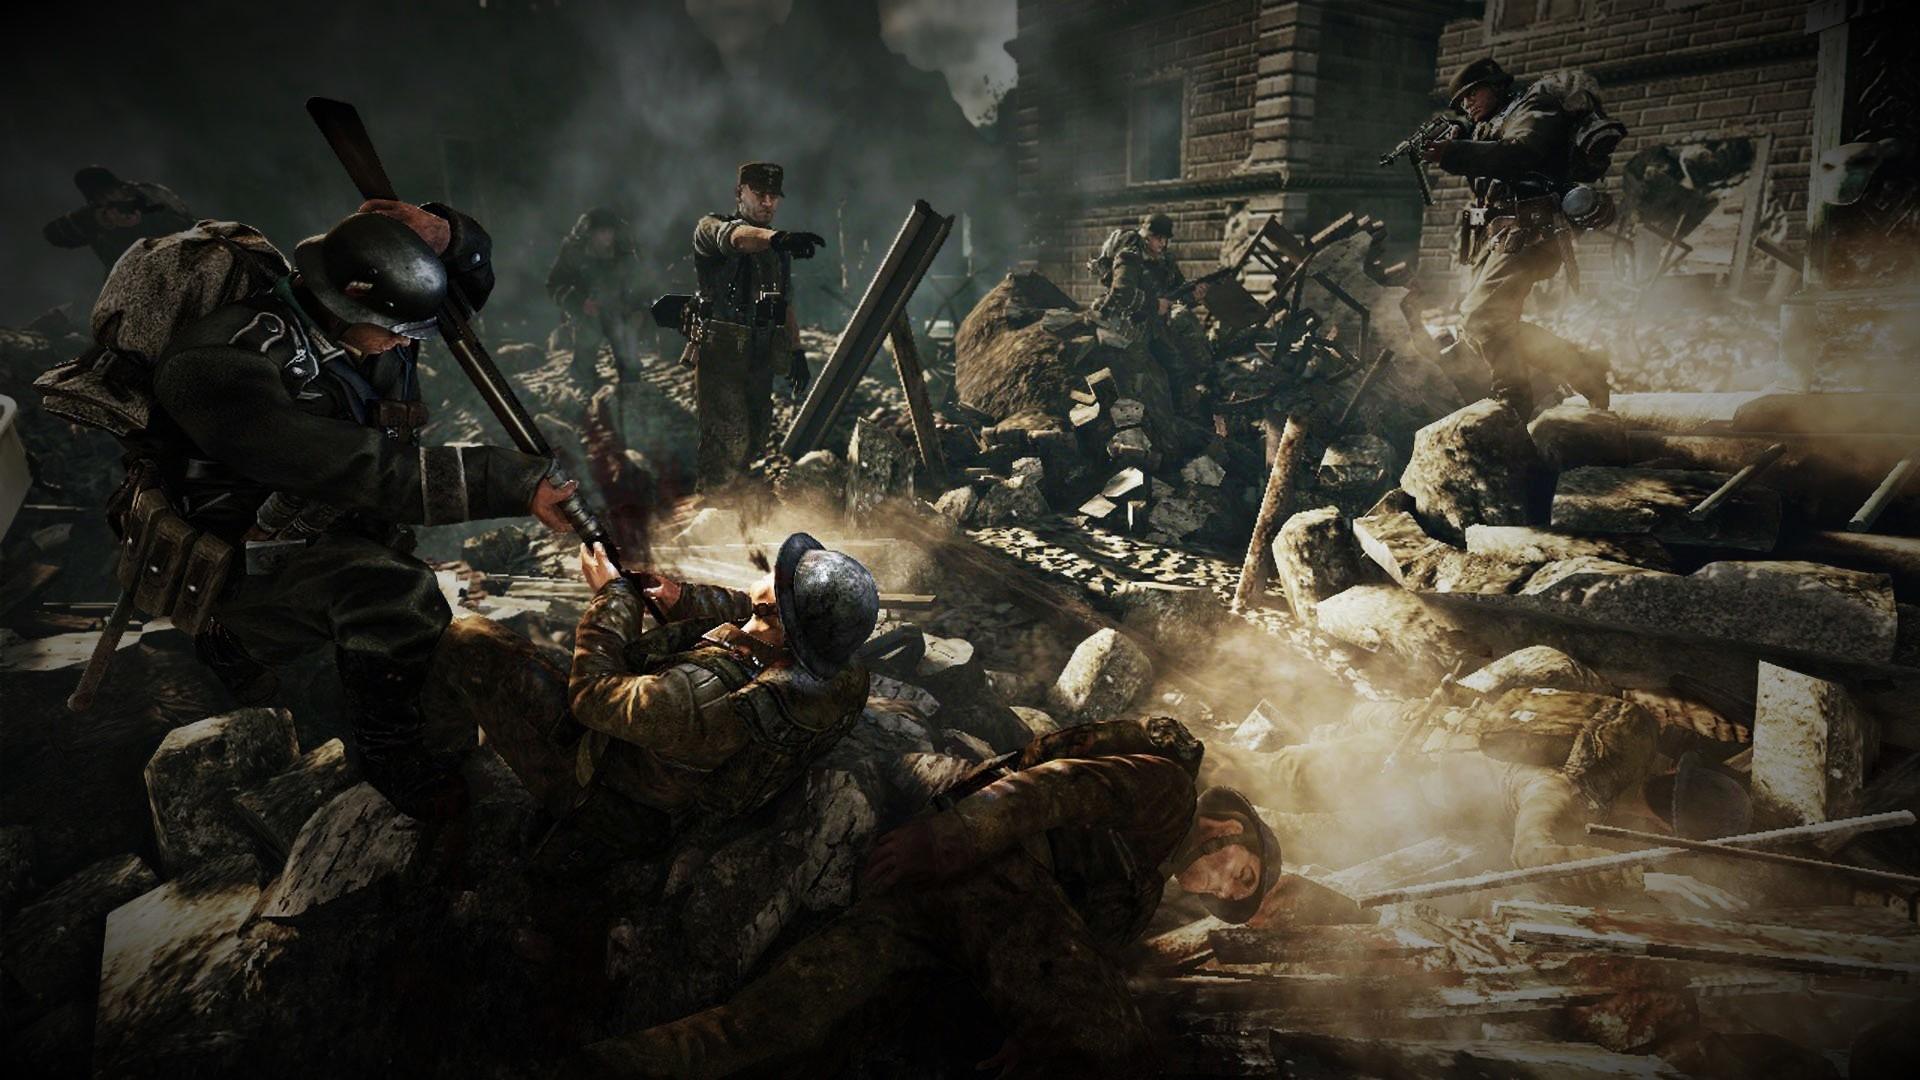 ENEMY_FRONT_war_military_shooter_ww2_wwll_fighting_battle_1920x1080